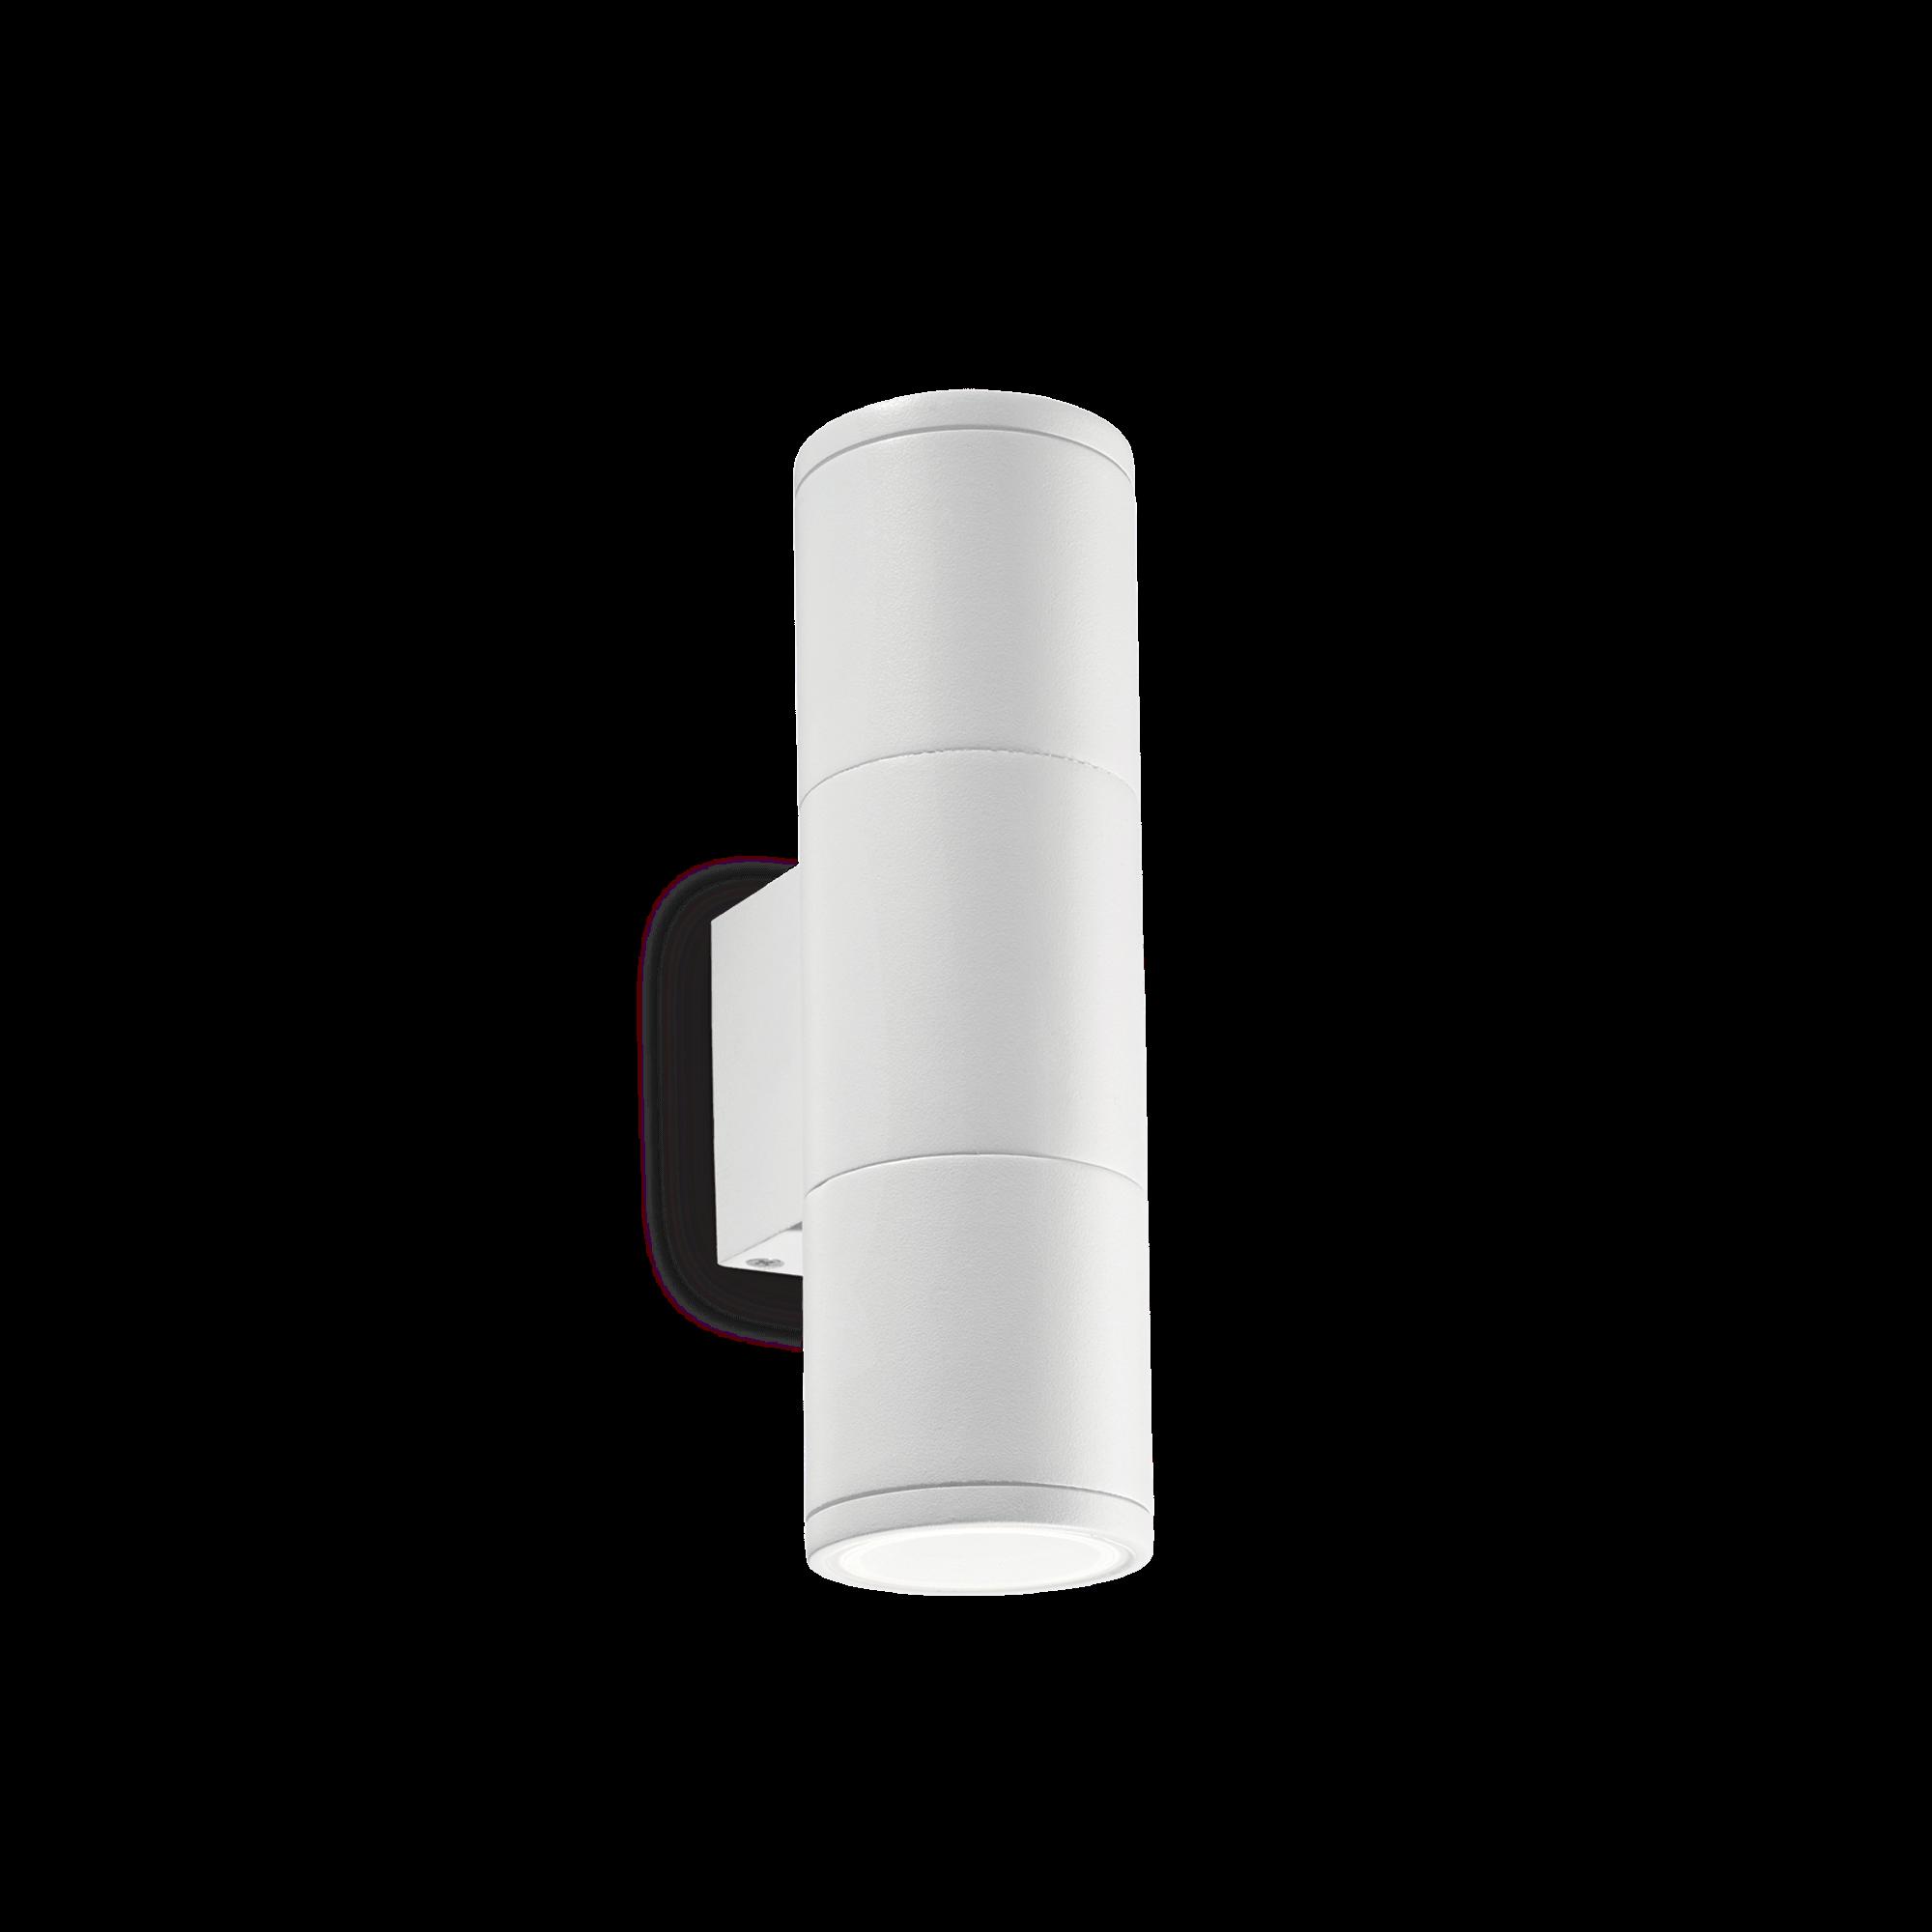 Ideal Lux 100388 Gun AP2 Small Bianco kültéri falilámpa